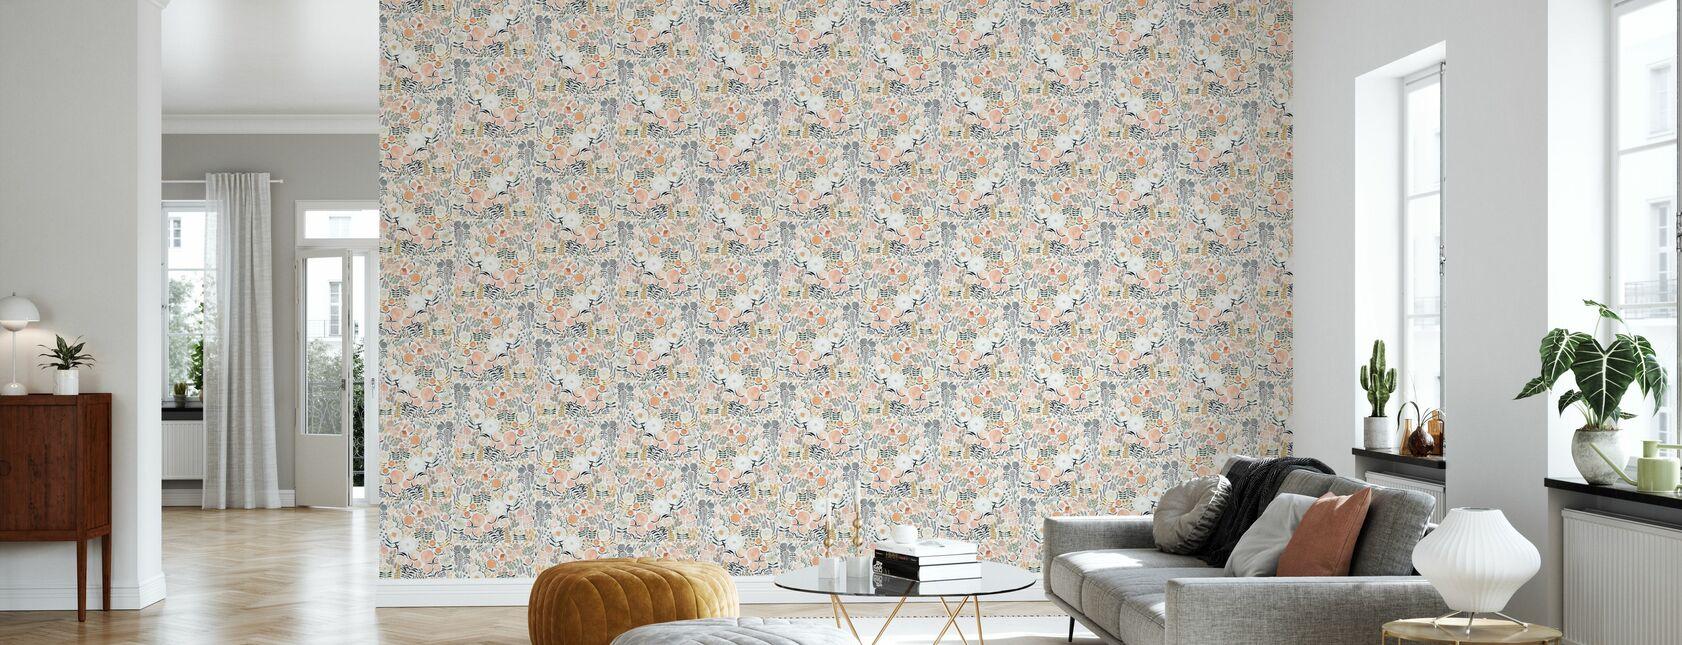 Sea of Flowers - Wallpaper - Living Room